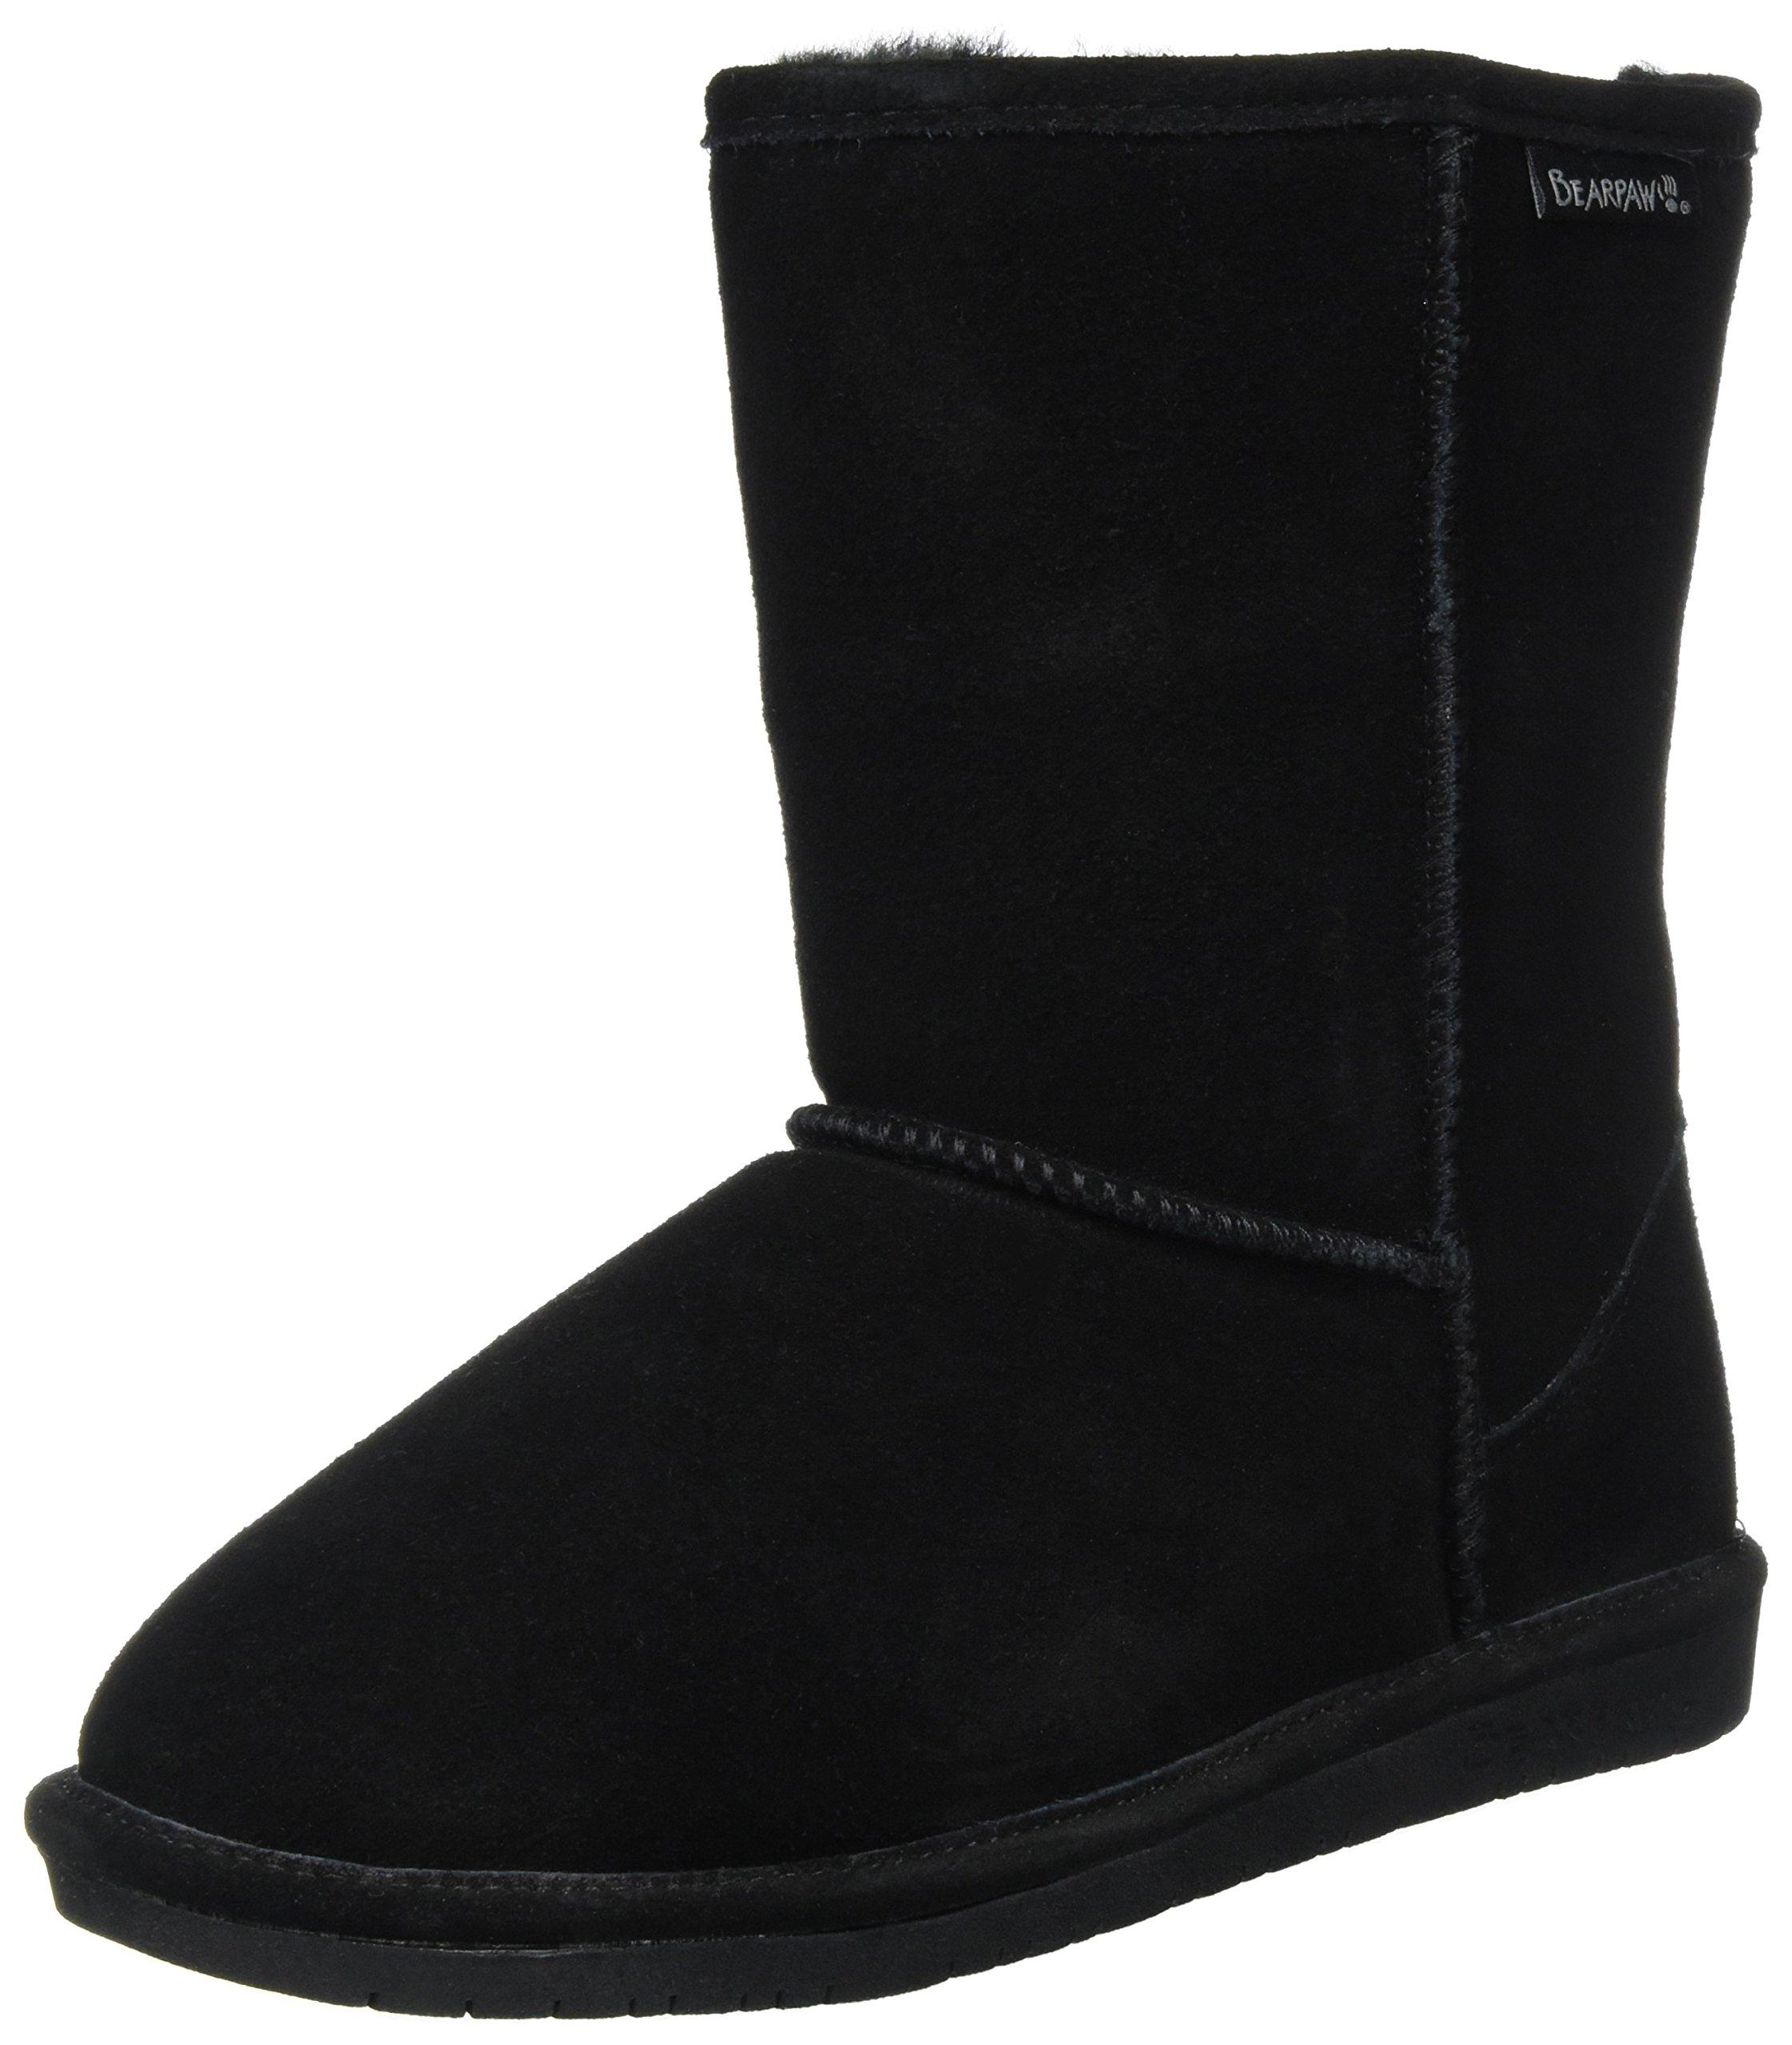 BEARPAW Women's EMMA 8'' Pull On Black Fashion Boot 5 M